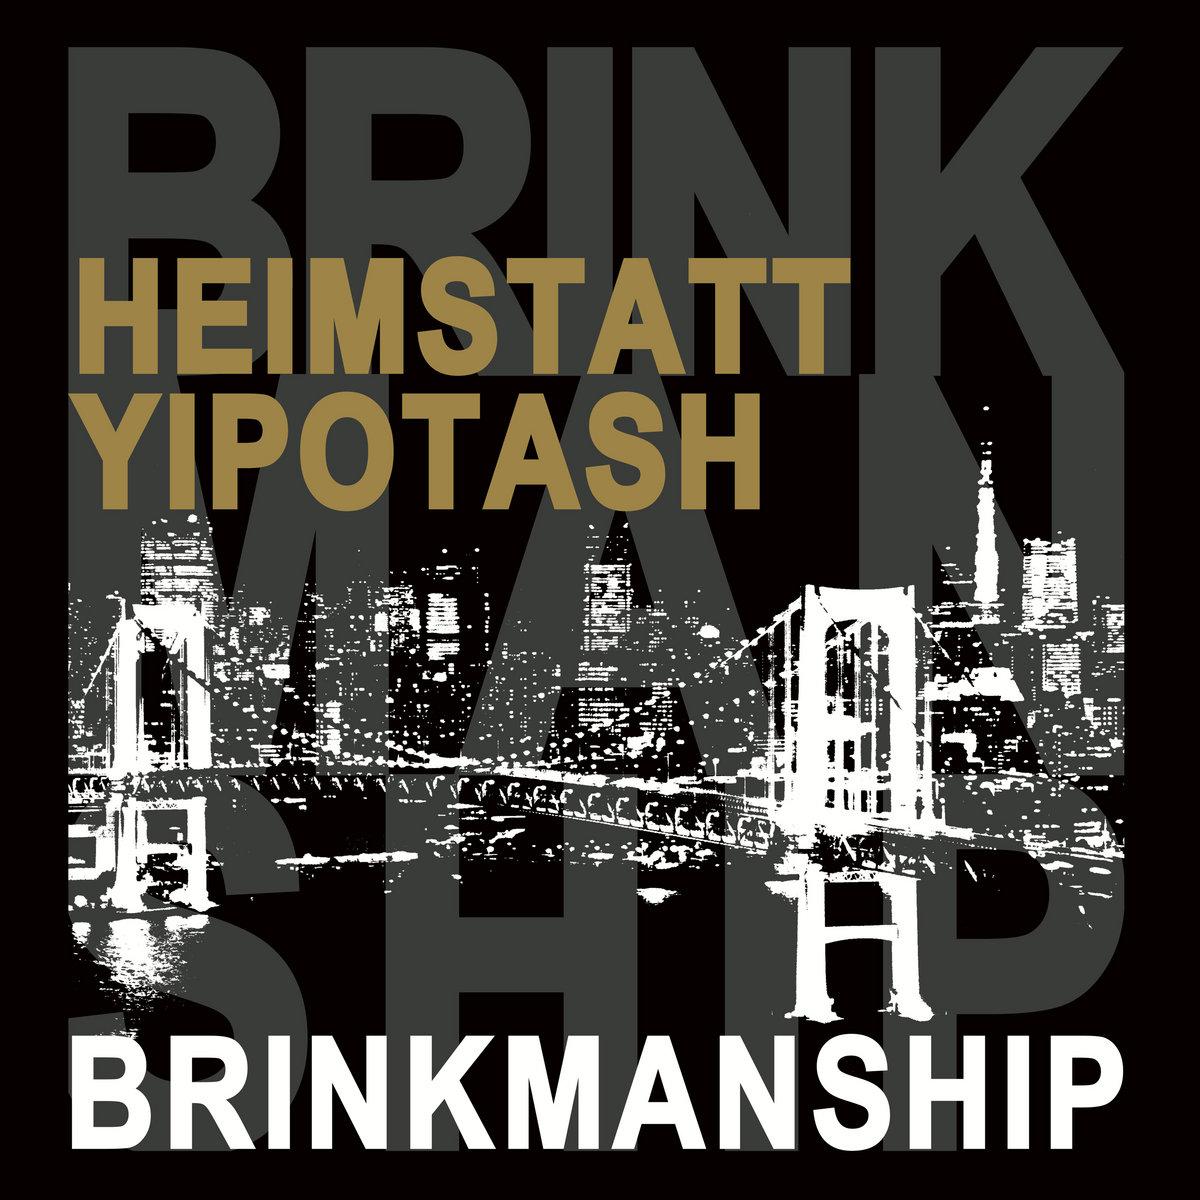 Heimstatt Yipotash - Brinkmanship (2020) [FLAC] Download